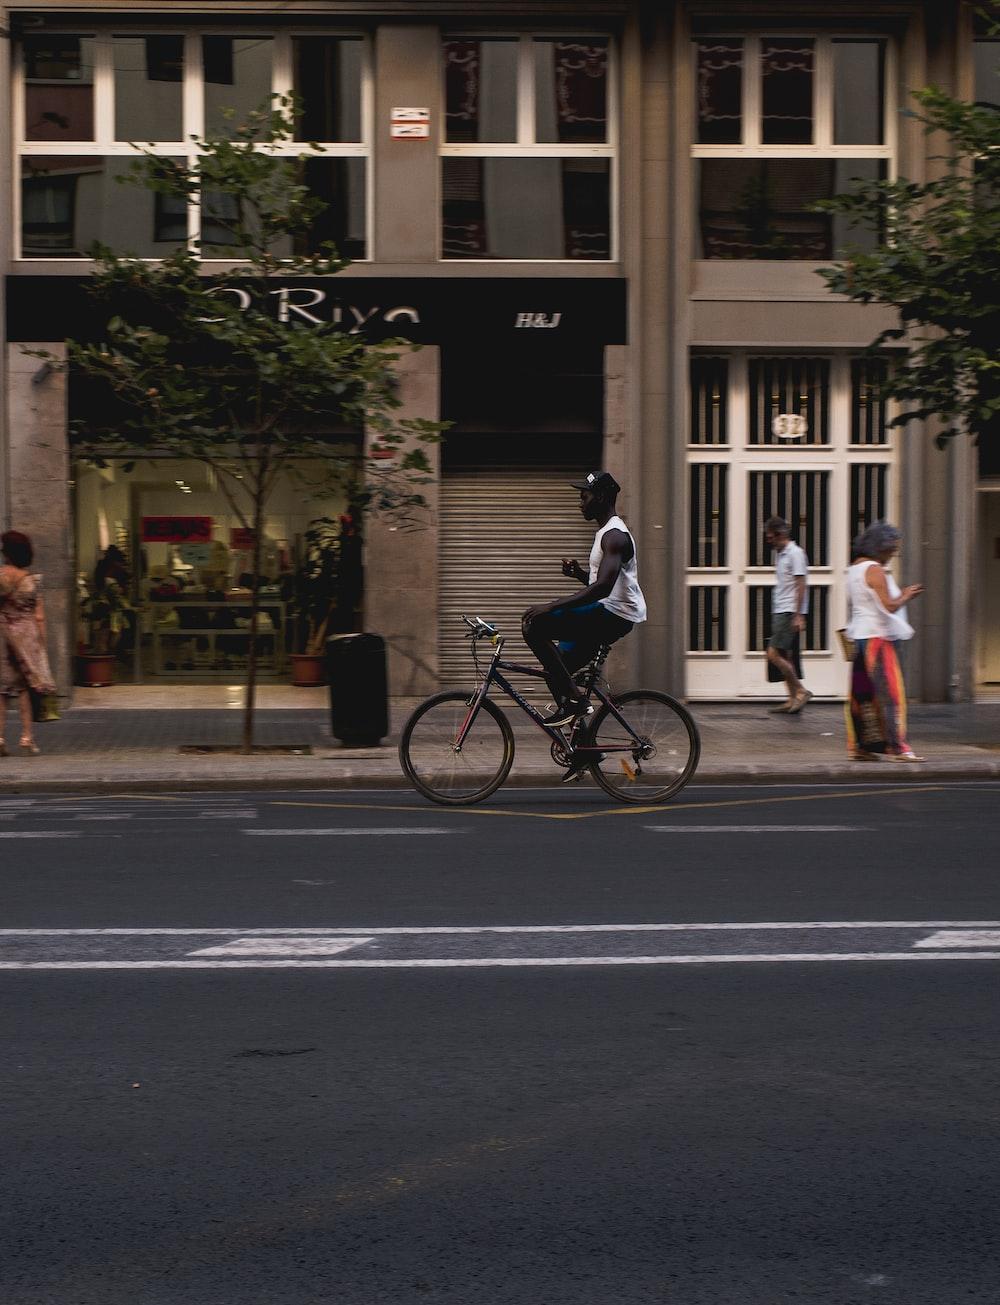 man on black bike in street